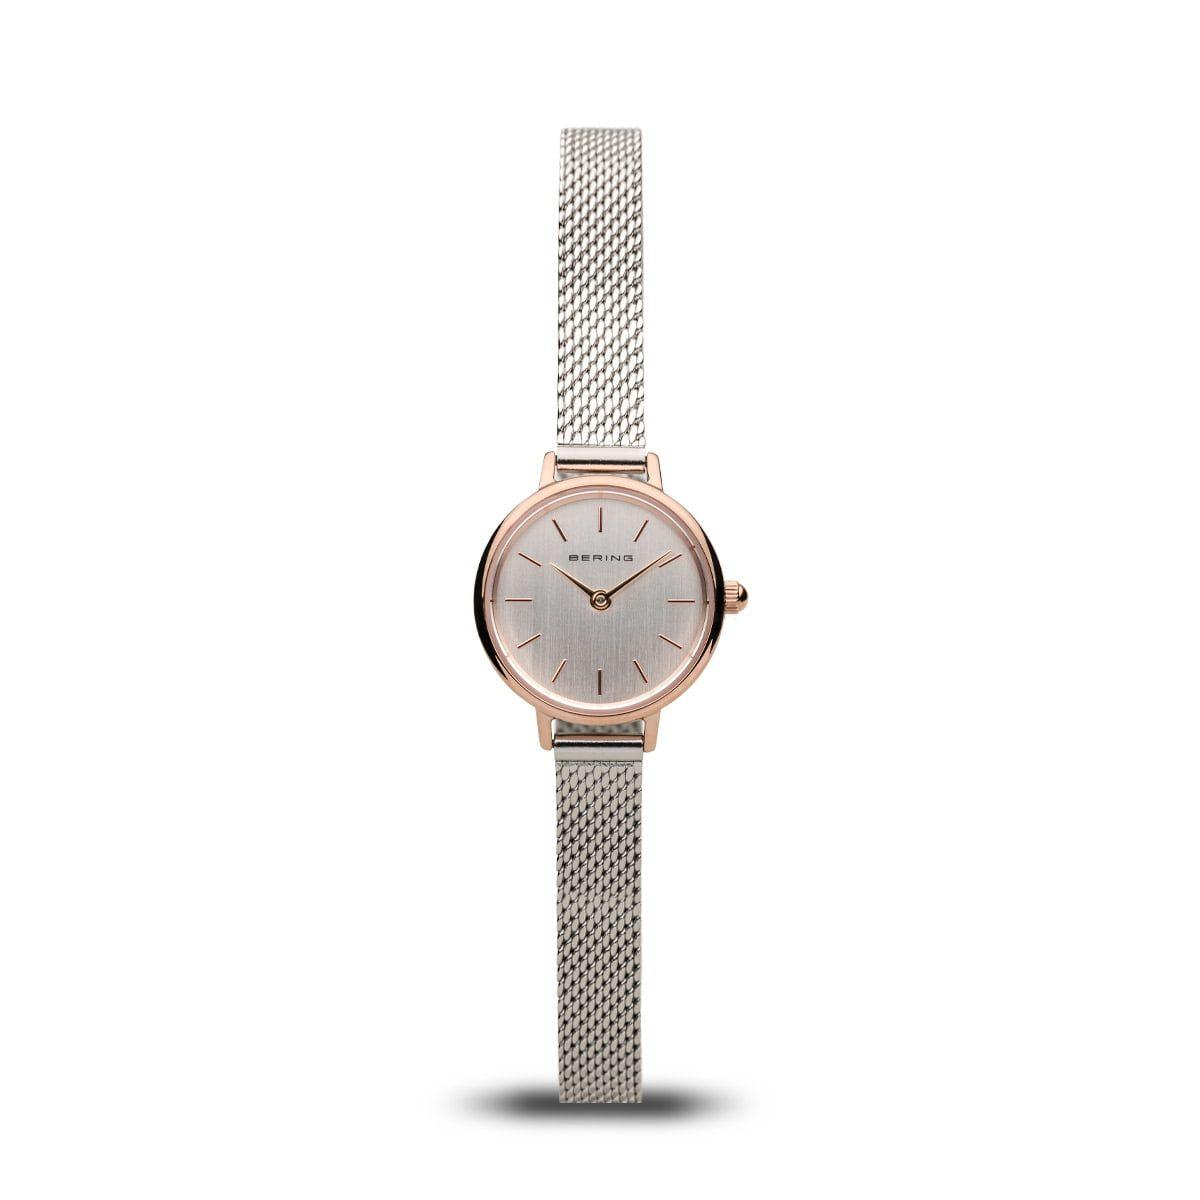 Bering Ladies' Classic Rose Gold Watch